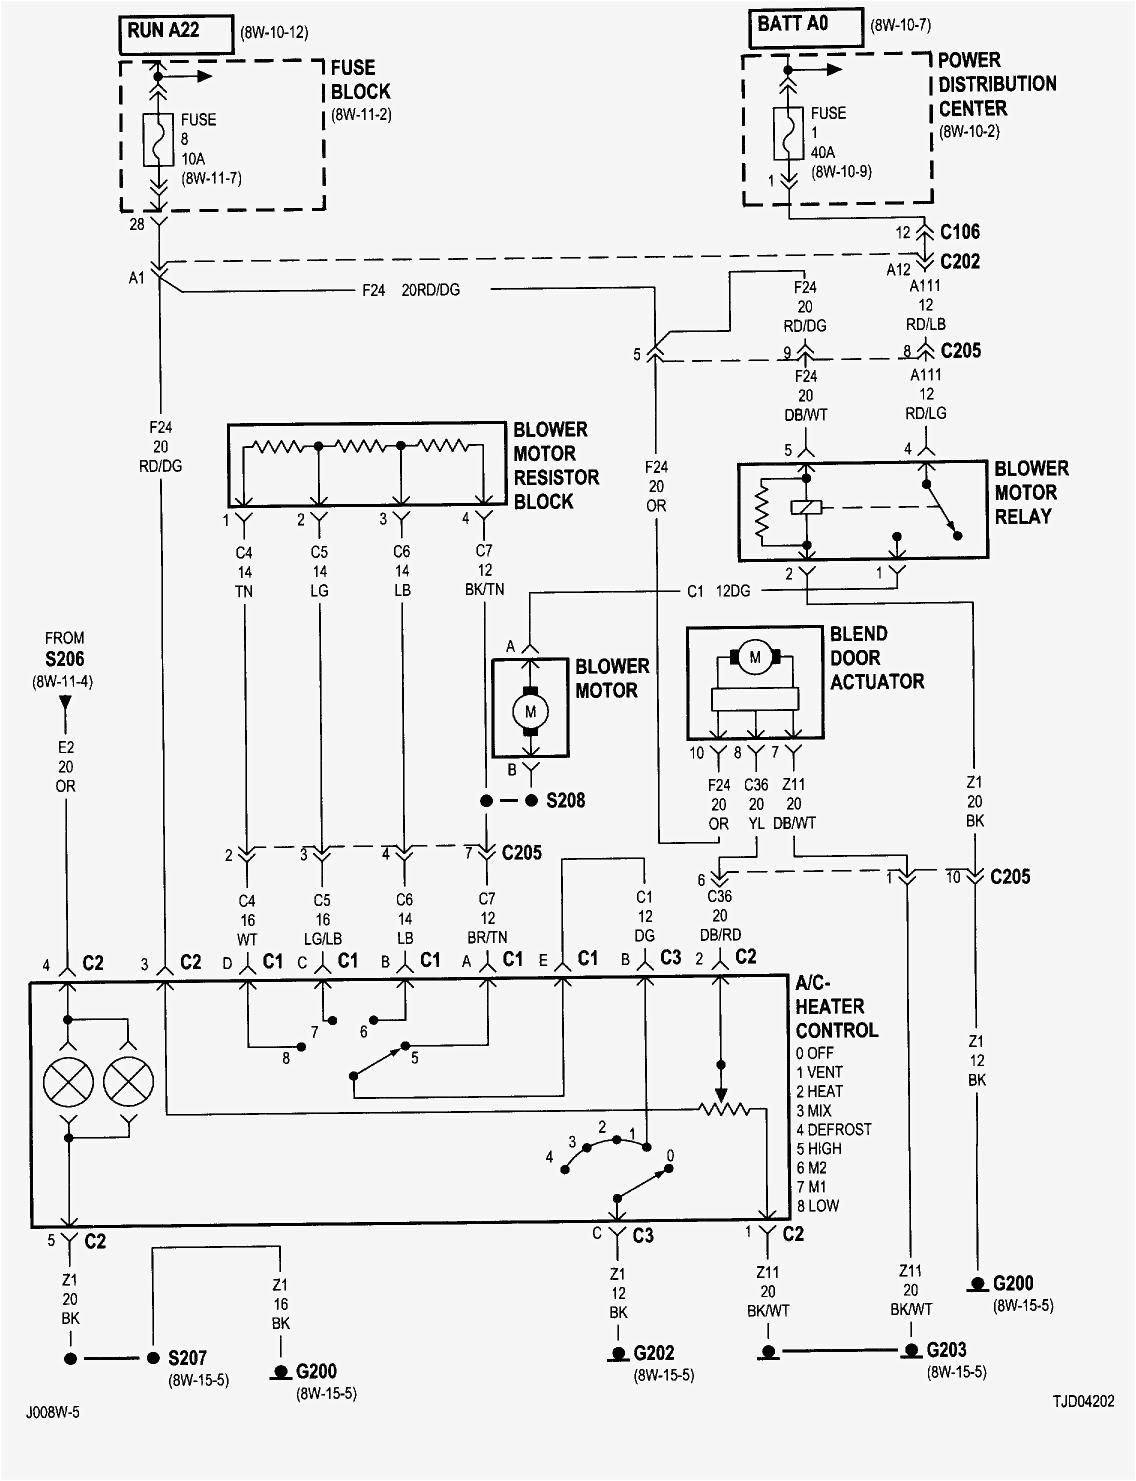 2010 jeep jk engine diagram wiring diagram term 2010 jeep wrangler unlimited engine diagram